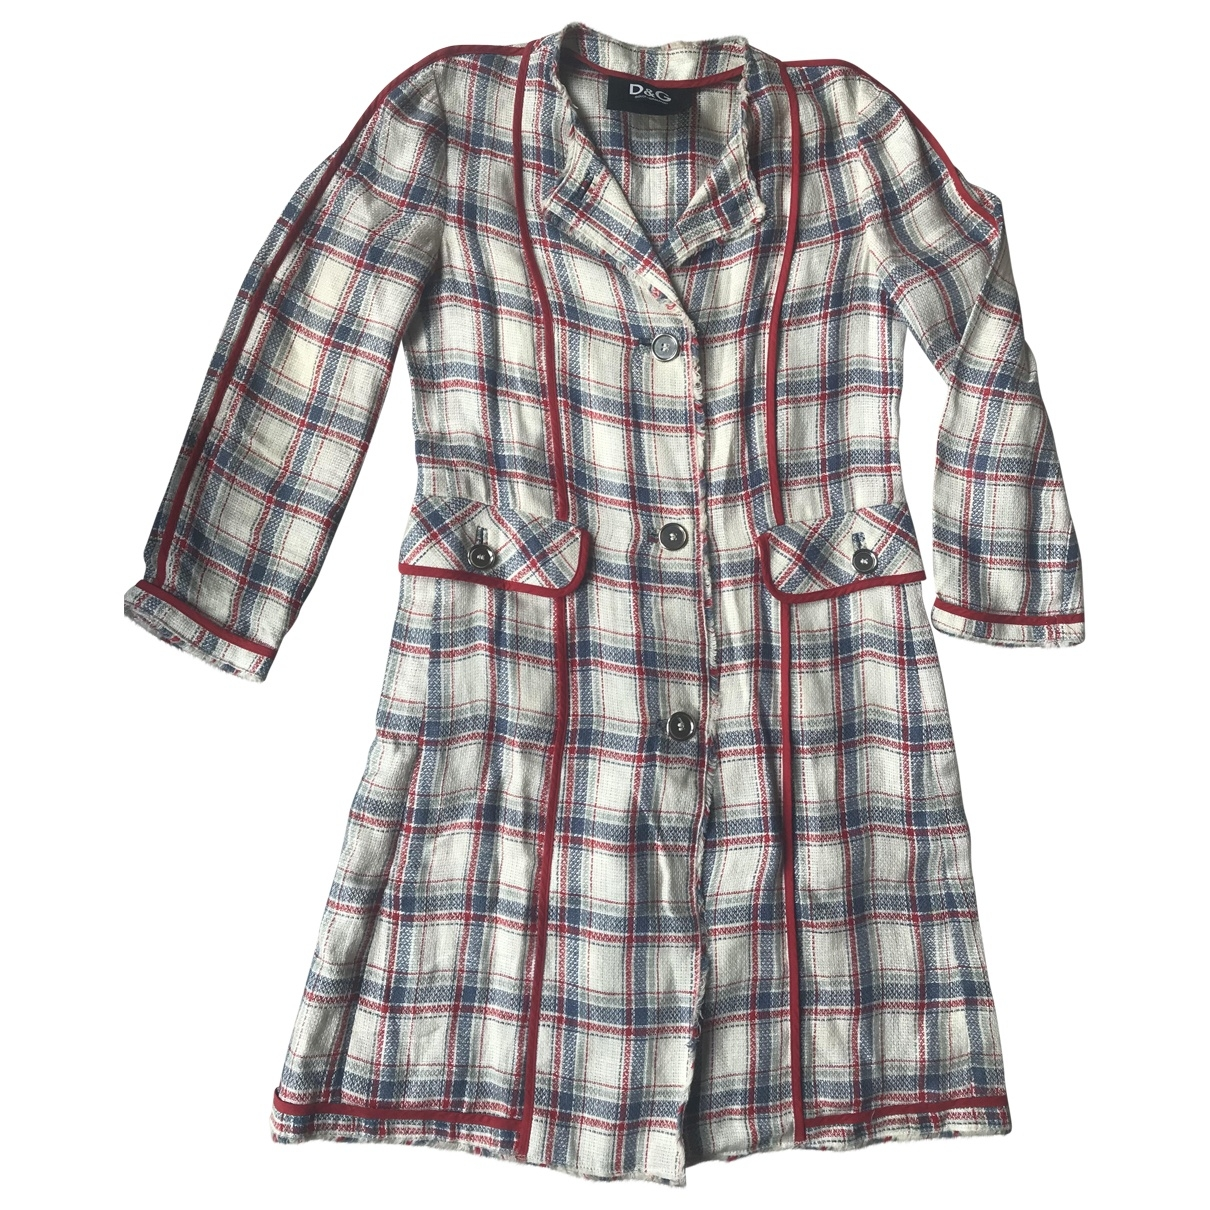 D&g \N Multicolour Linen coat for Women 44 IT